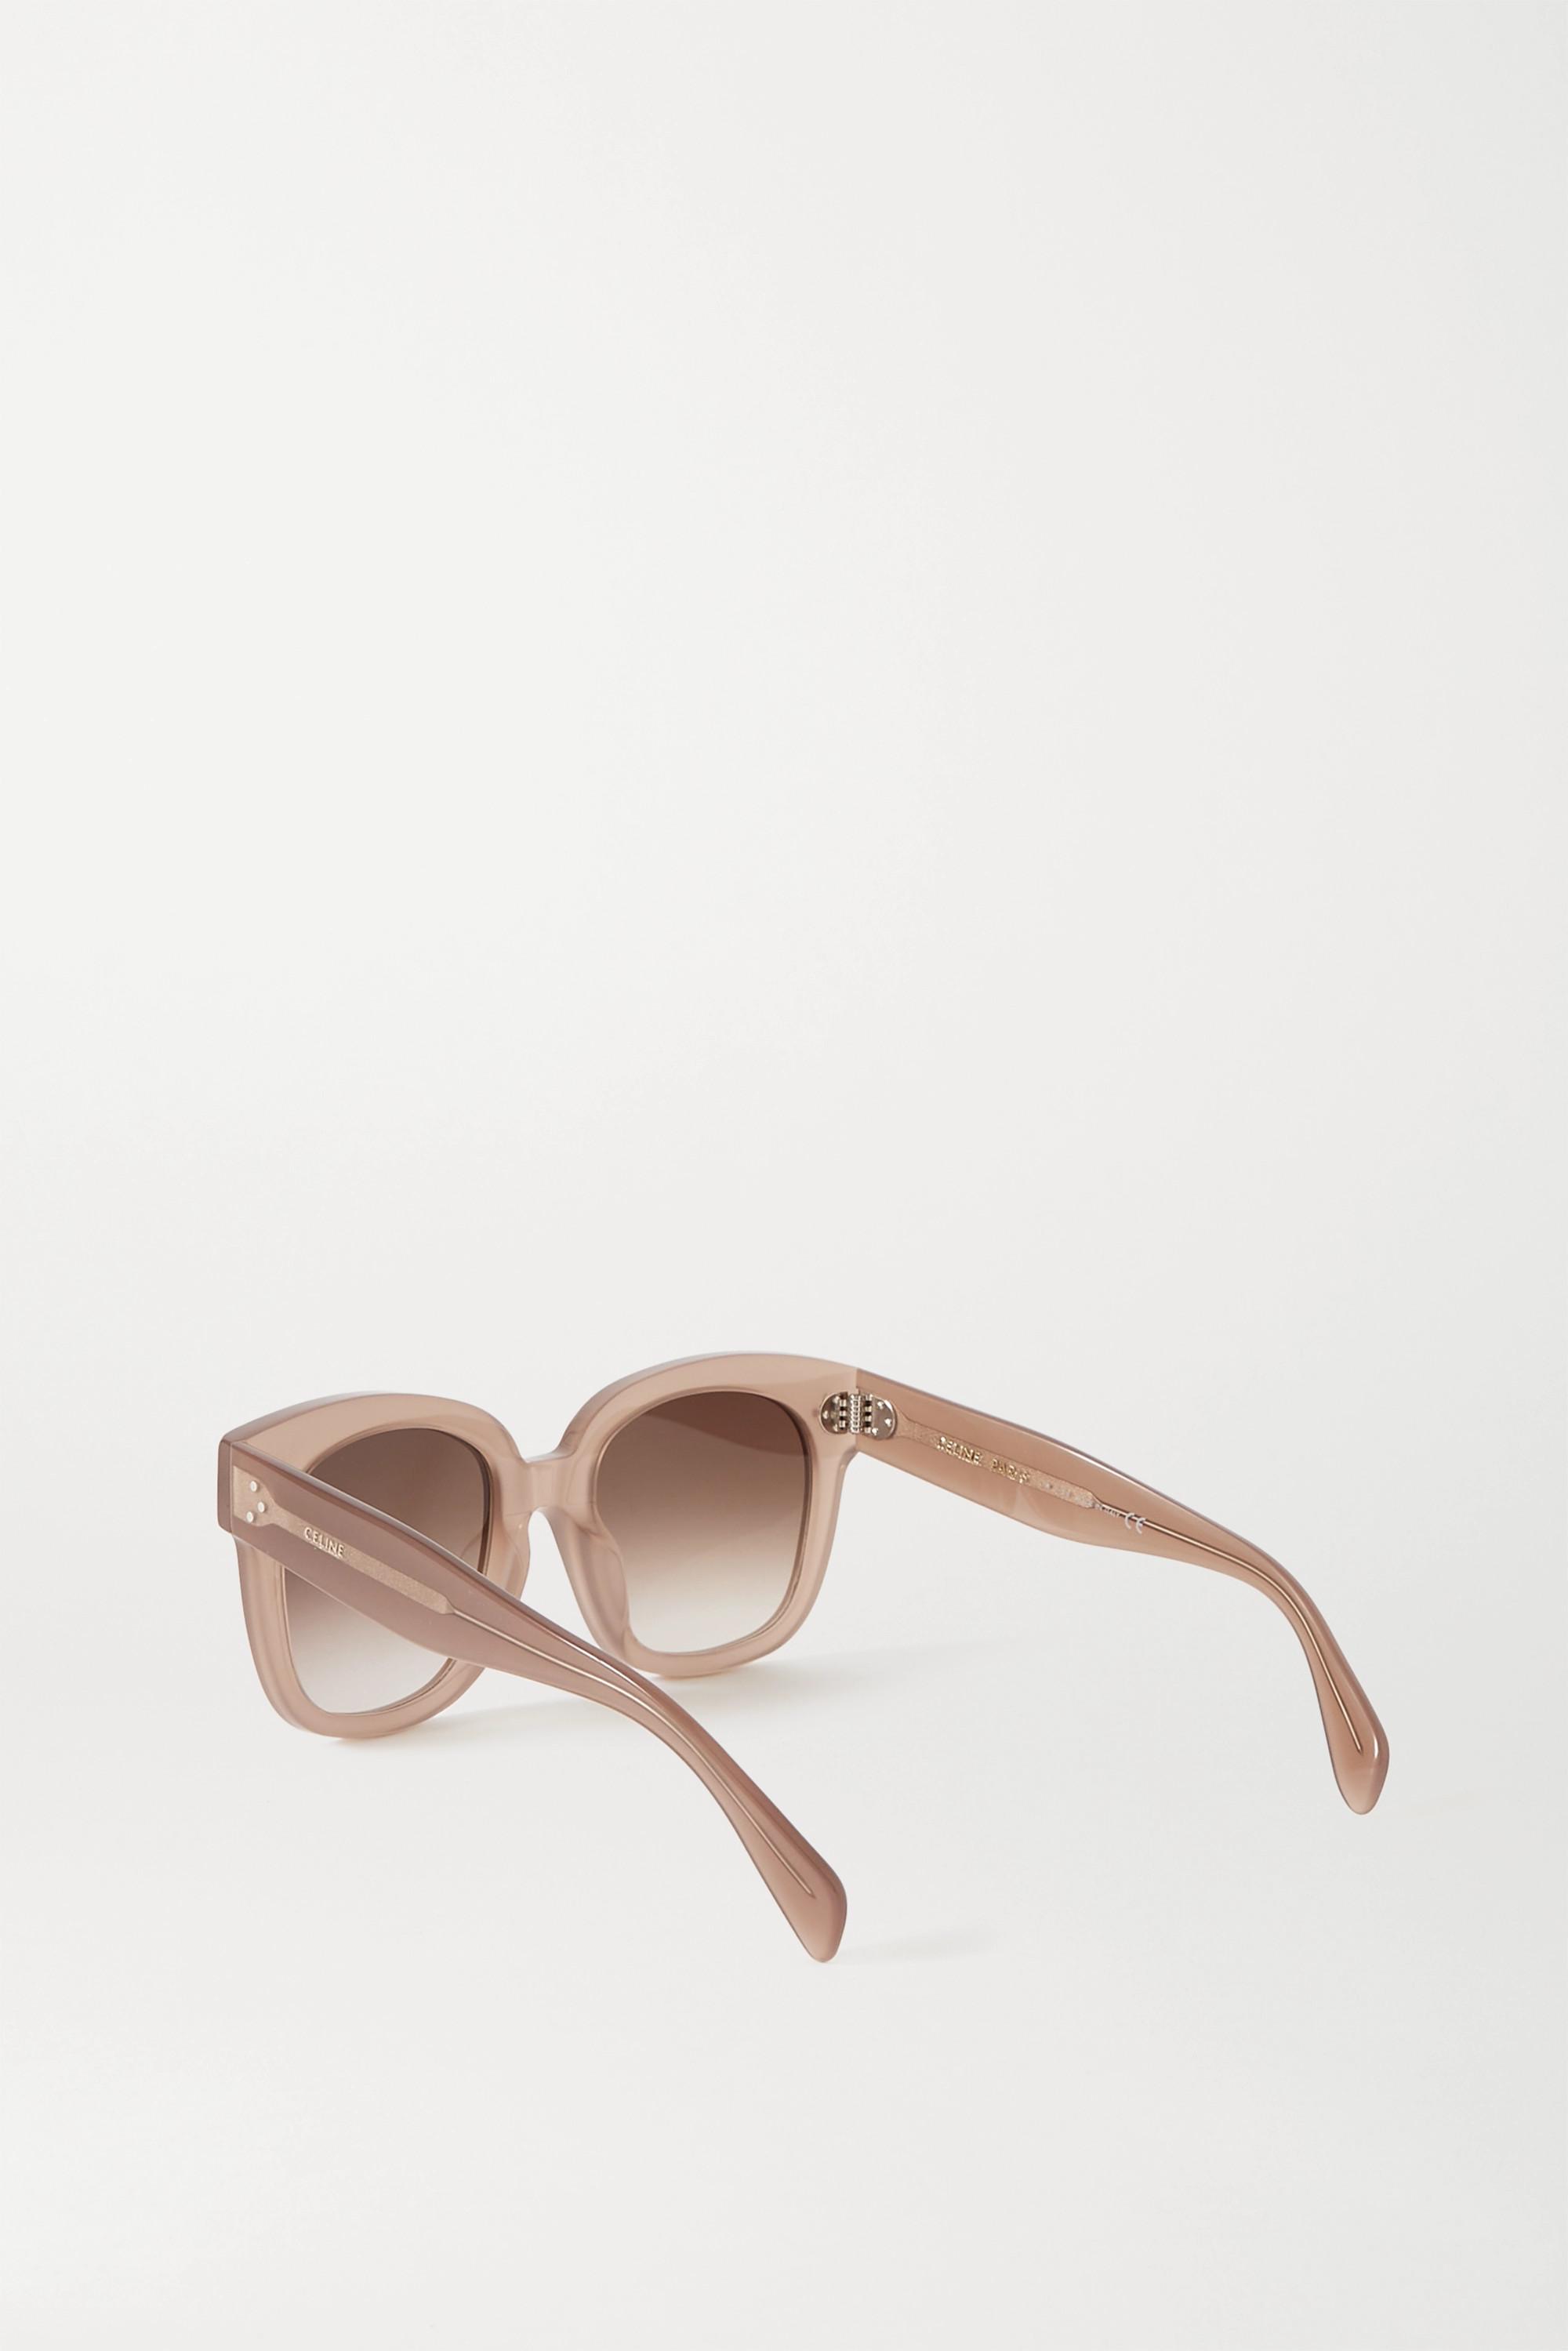 CELINE Eyewear Square-frame acetate sunglasses